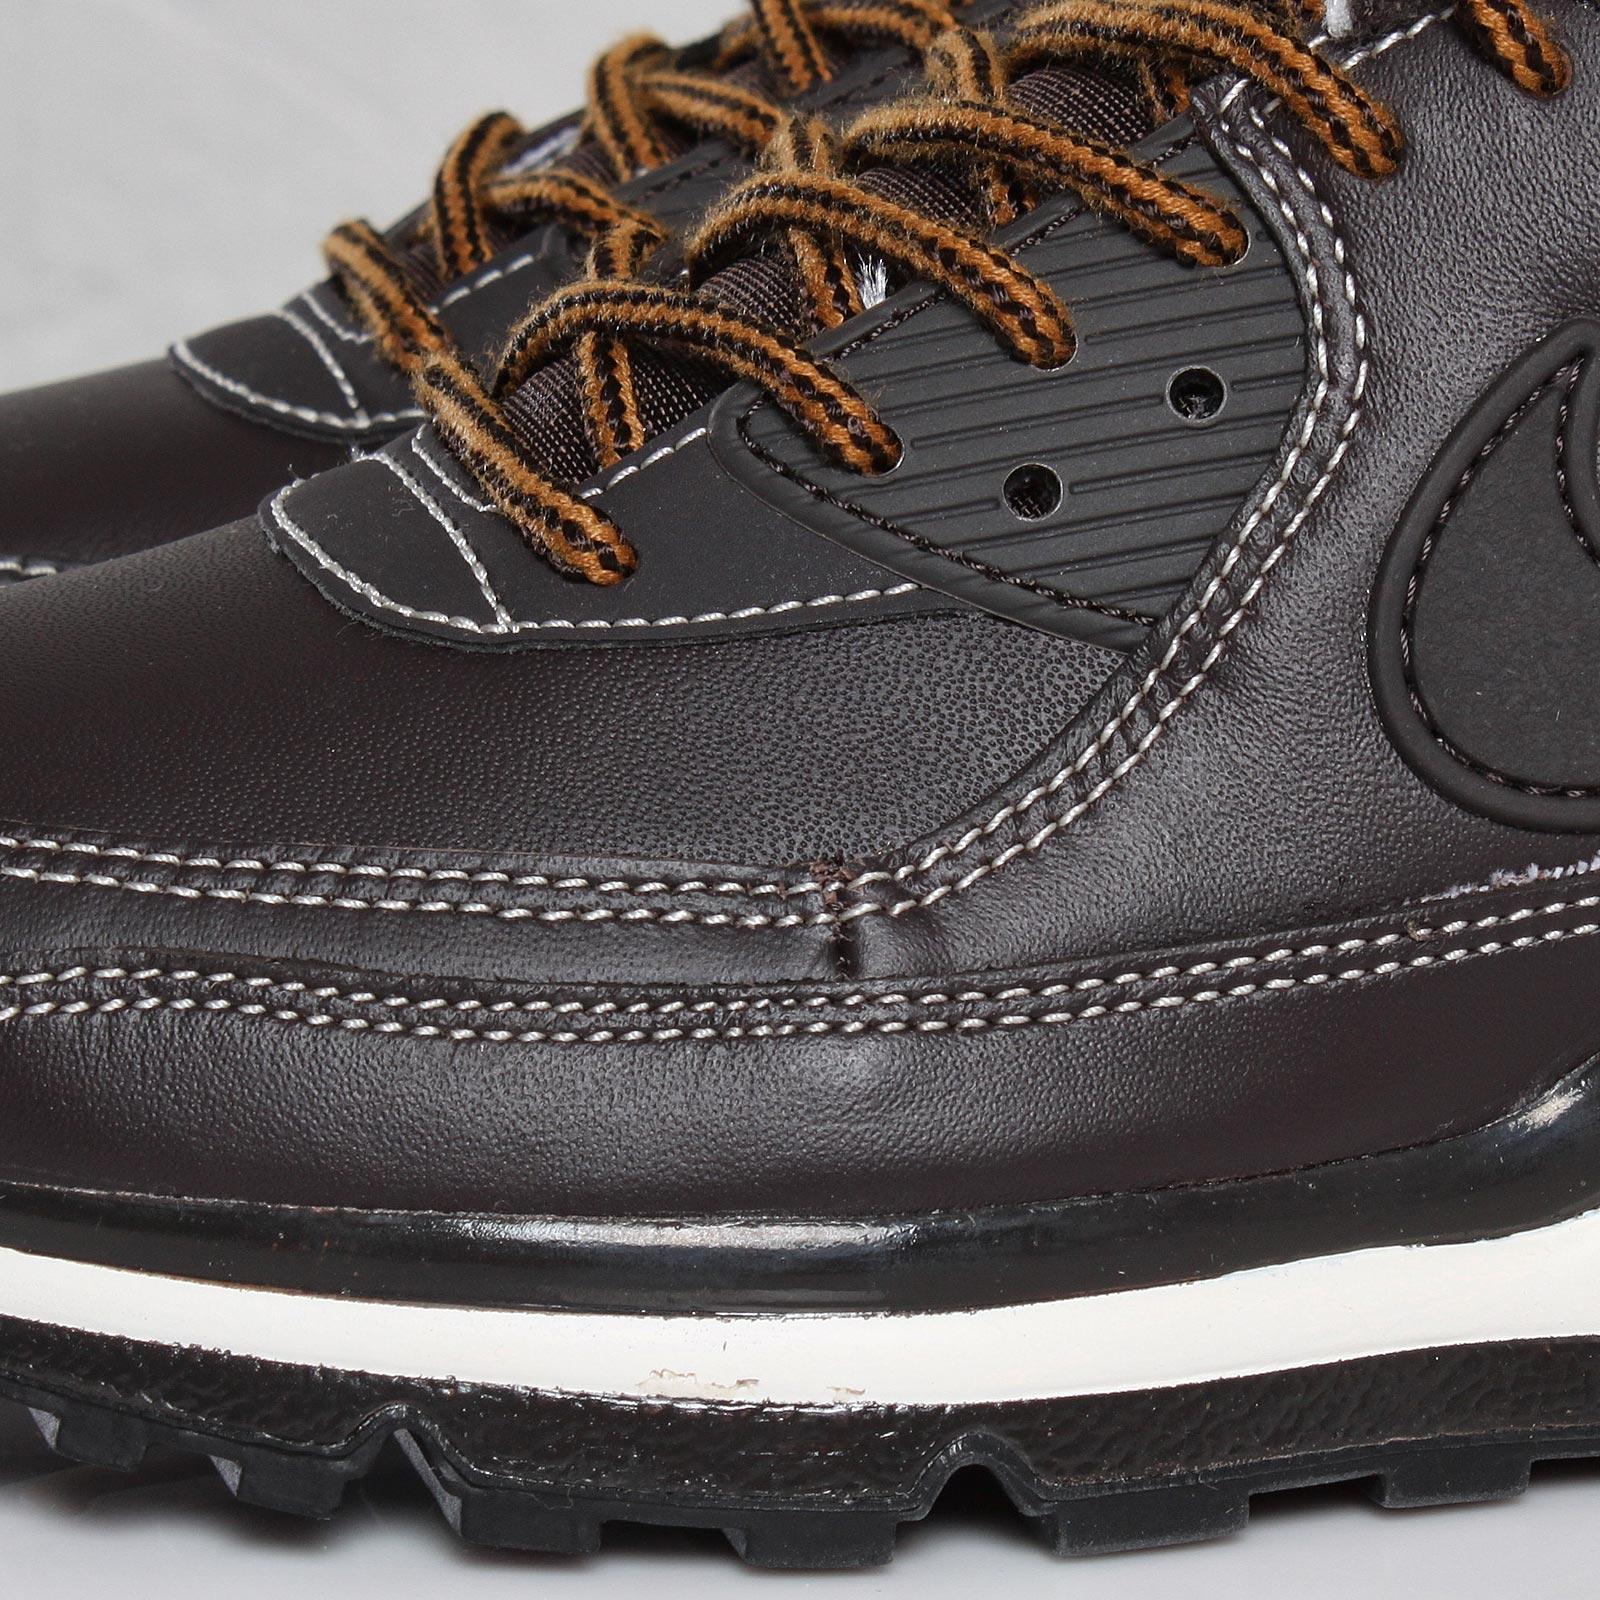 buy online 6af5e cb866 Nike Air Max Ltd II Plus - 8. Close